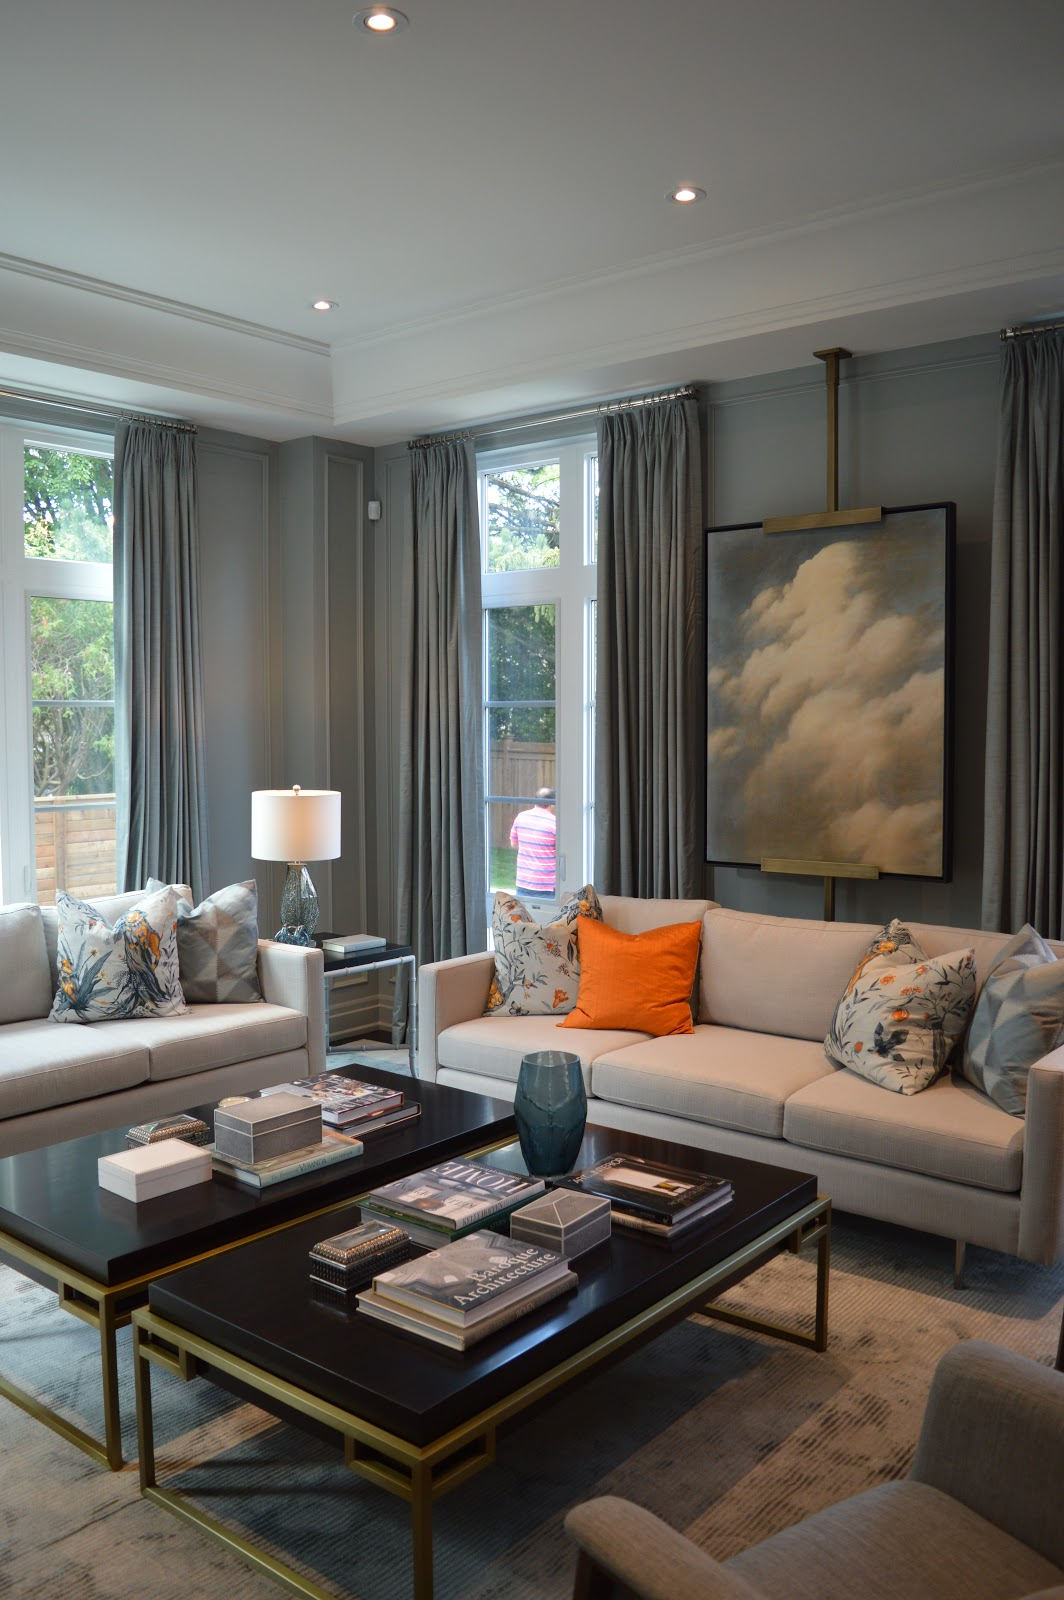 Princess Margaret Lotto Home Designed By Brian Gluckstein